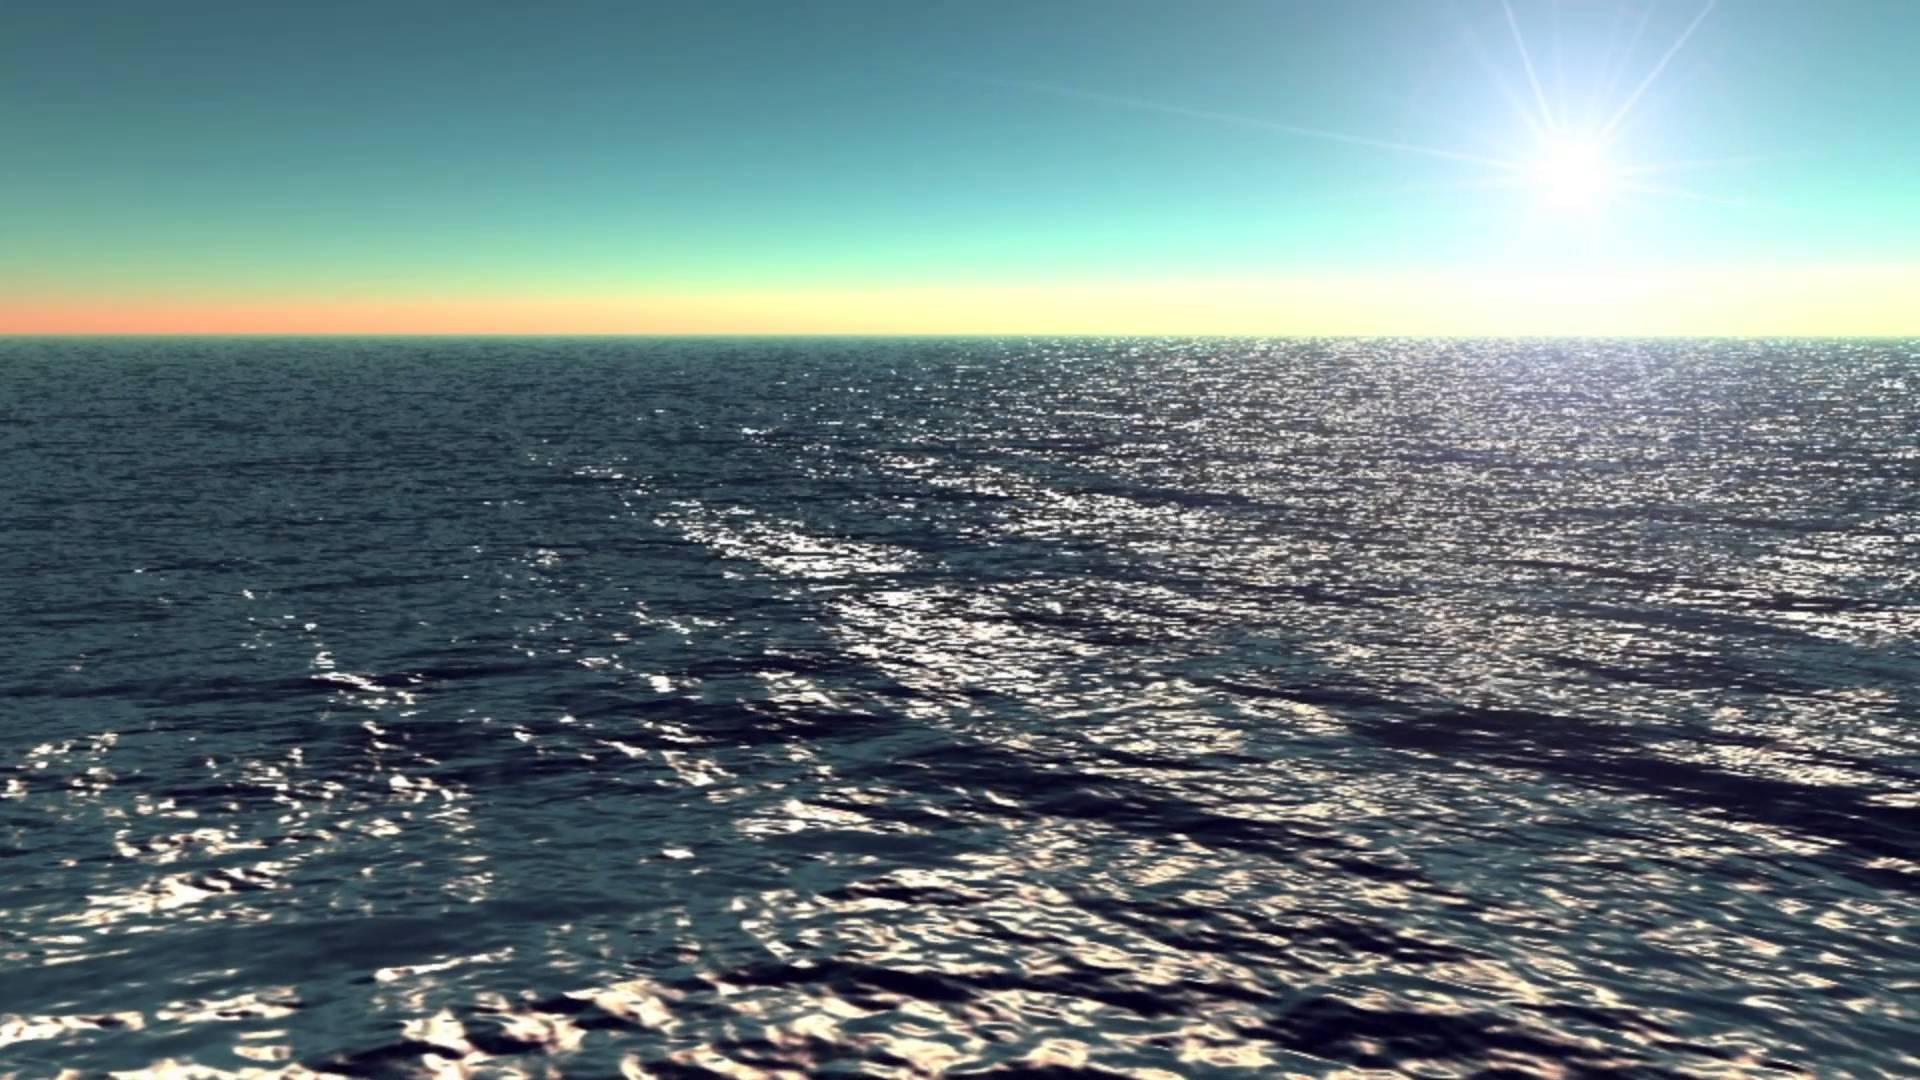 Silent sea photo